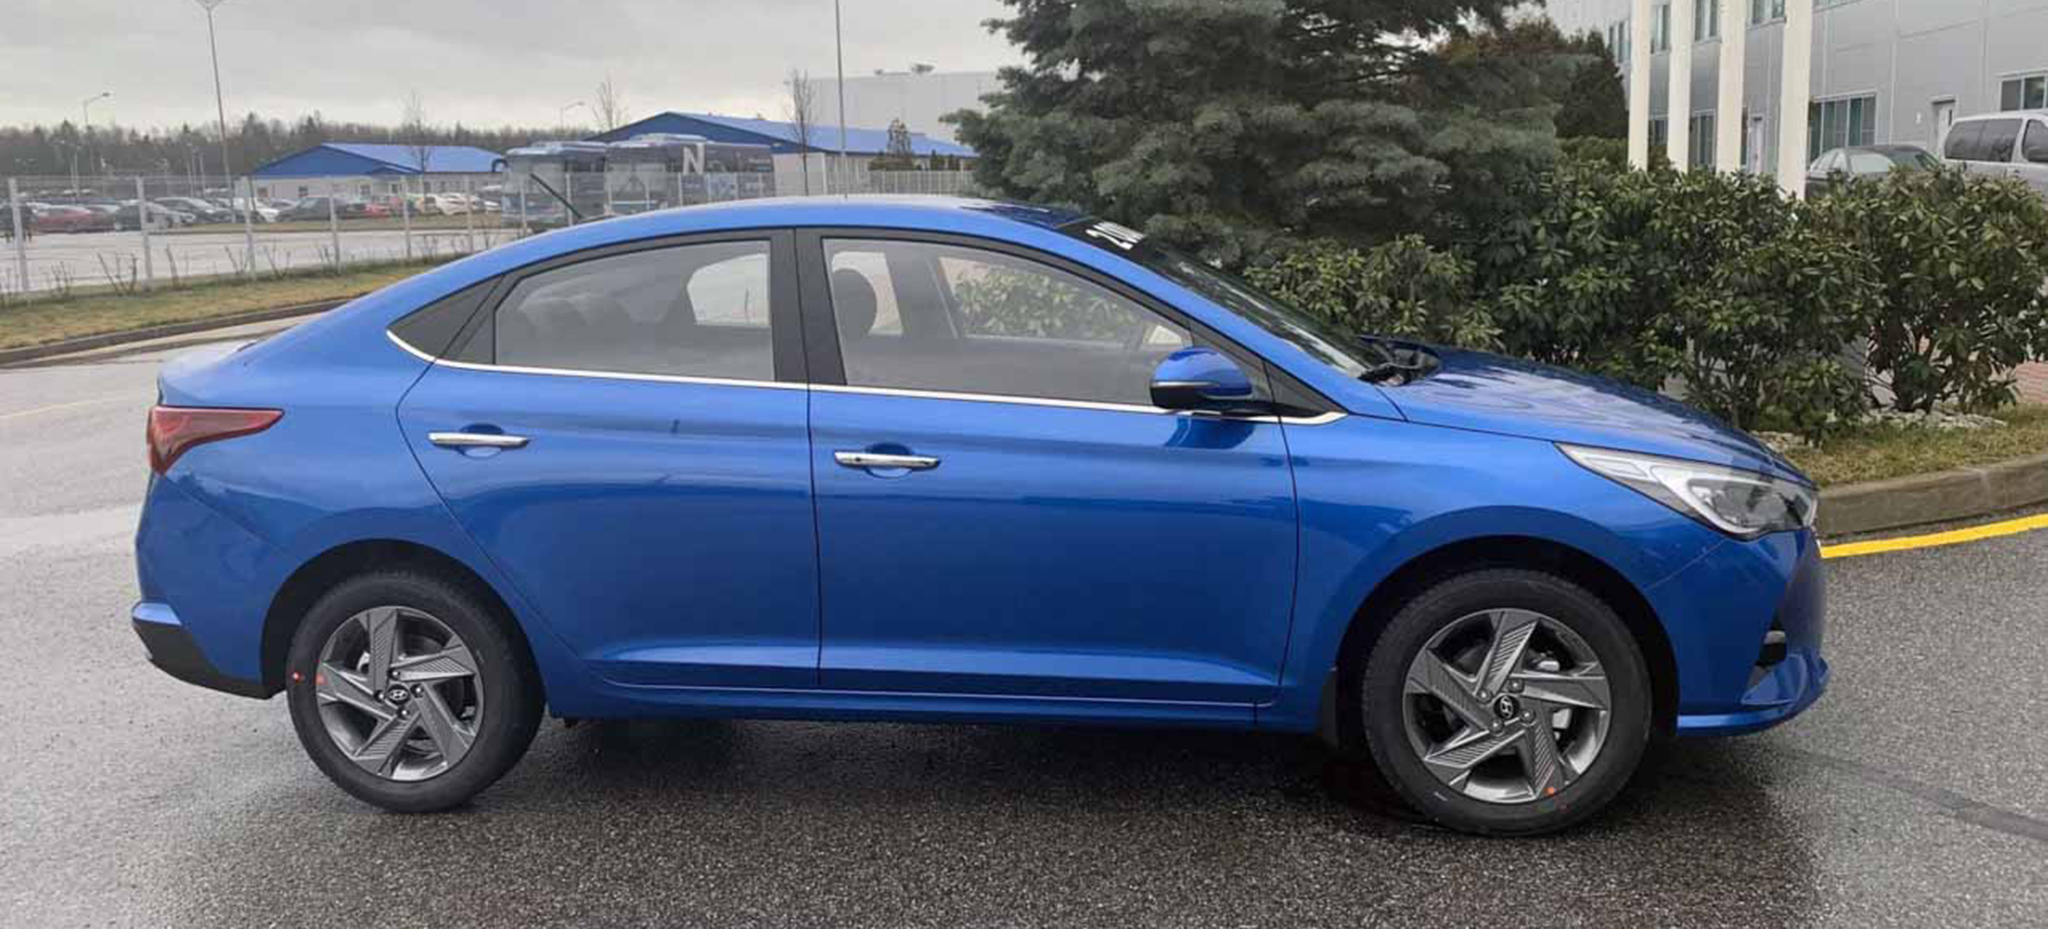 2020-hyundai-verna-facelift-2.jpg